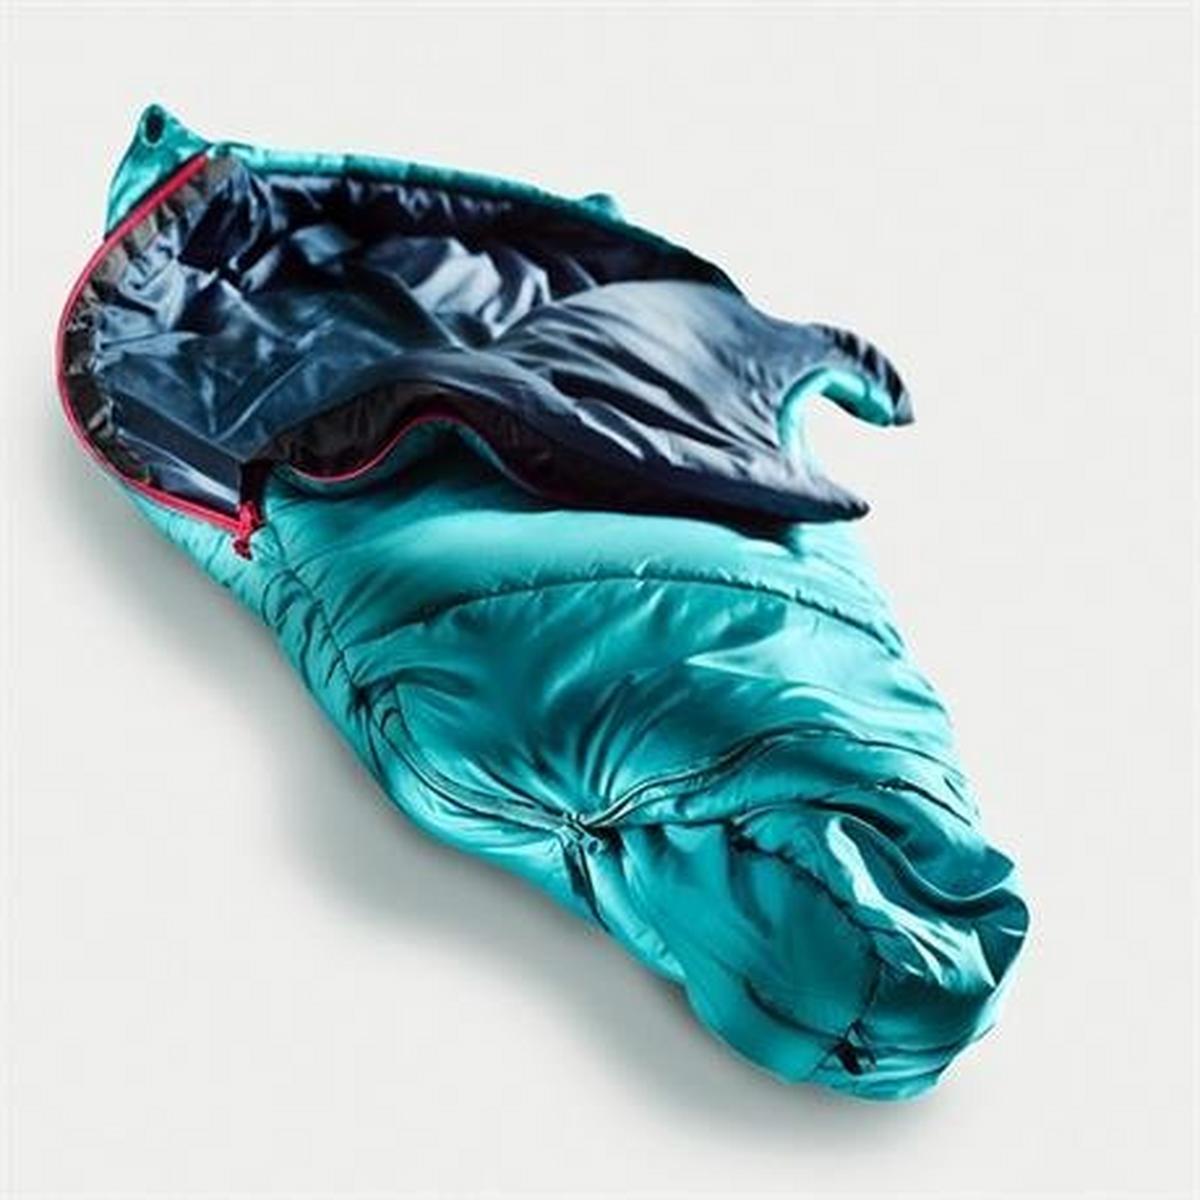 Deuter Children's Sleeping Bag Little Star EXP Petrol/Navy